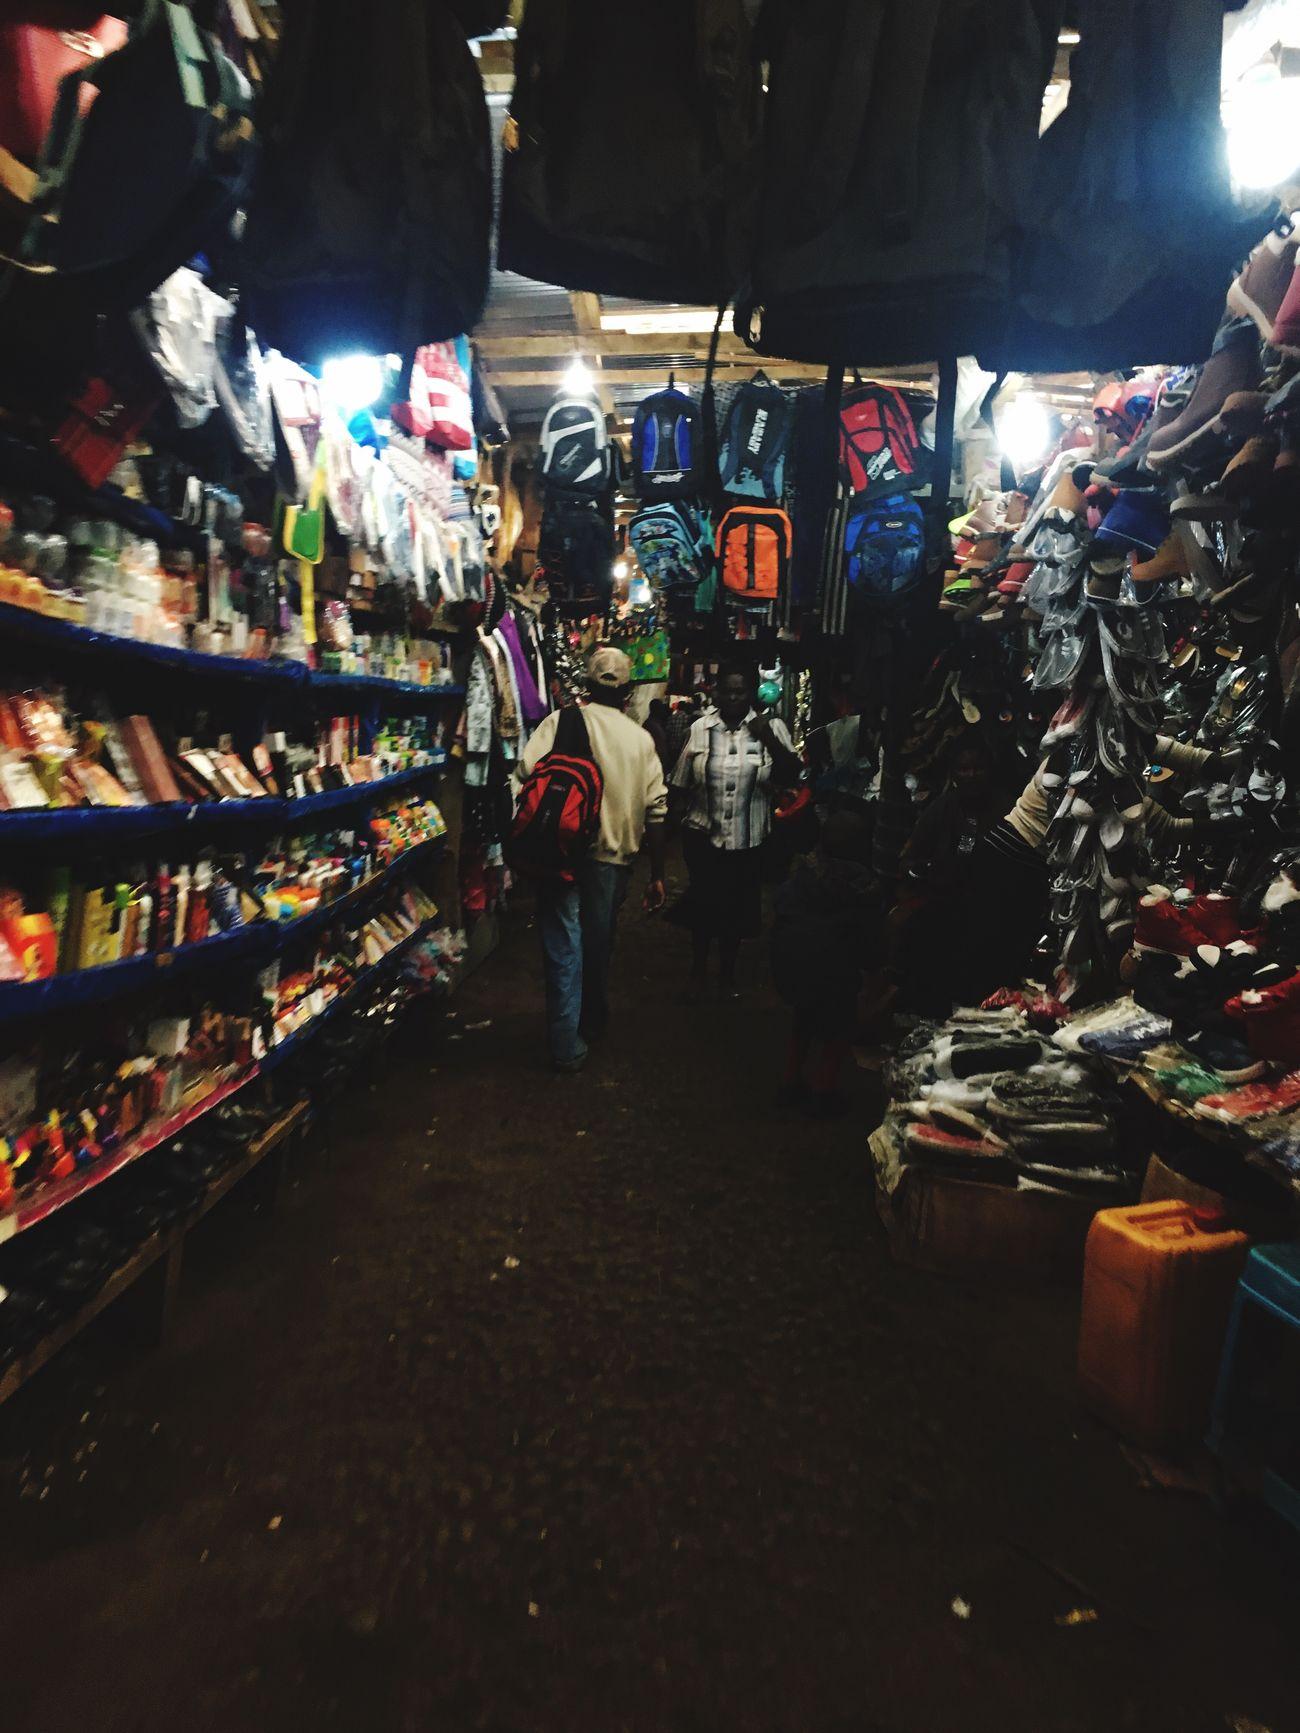 Toi Market Second Hand Market Nairobi Kenya Africa Urban Adventure